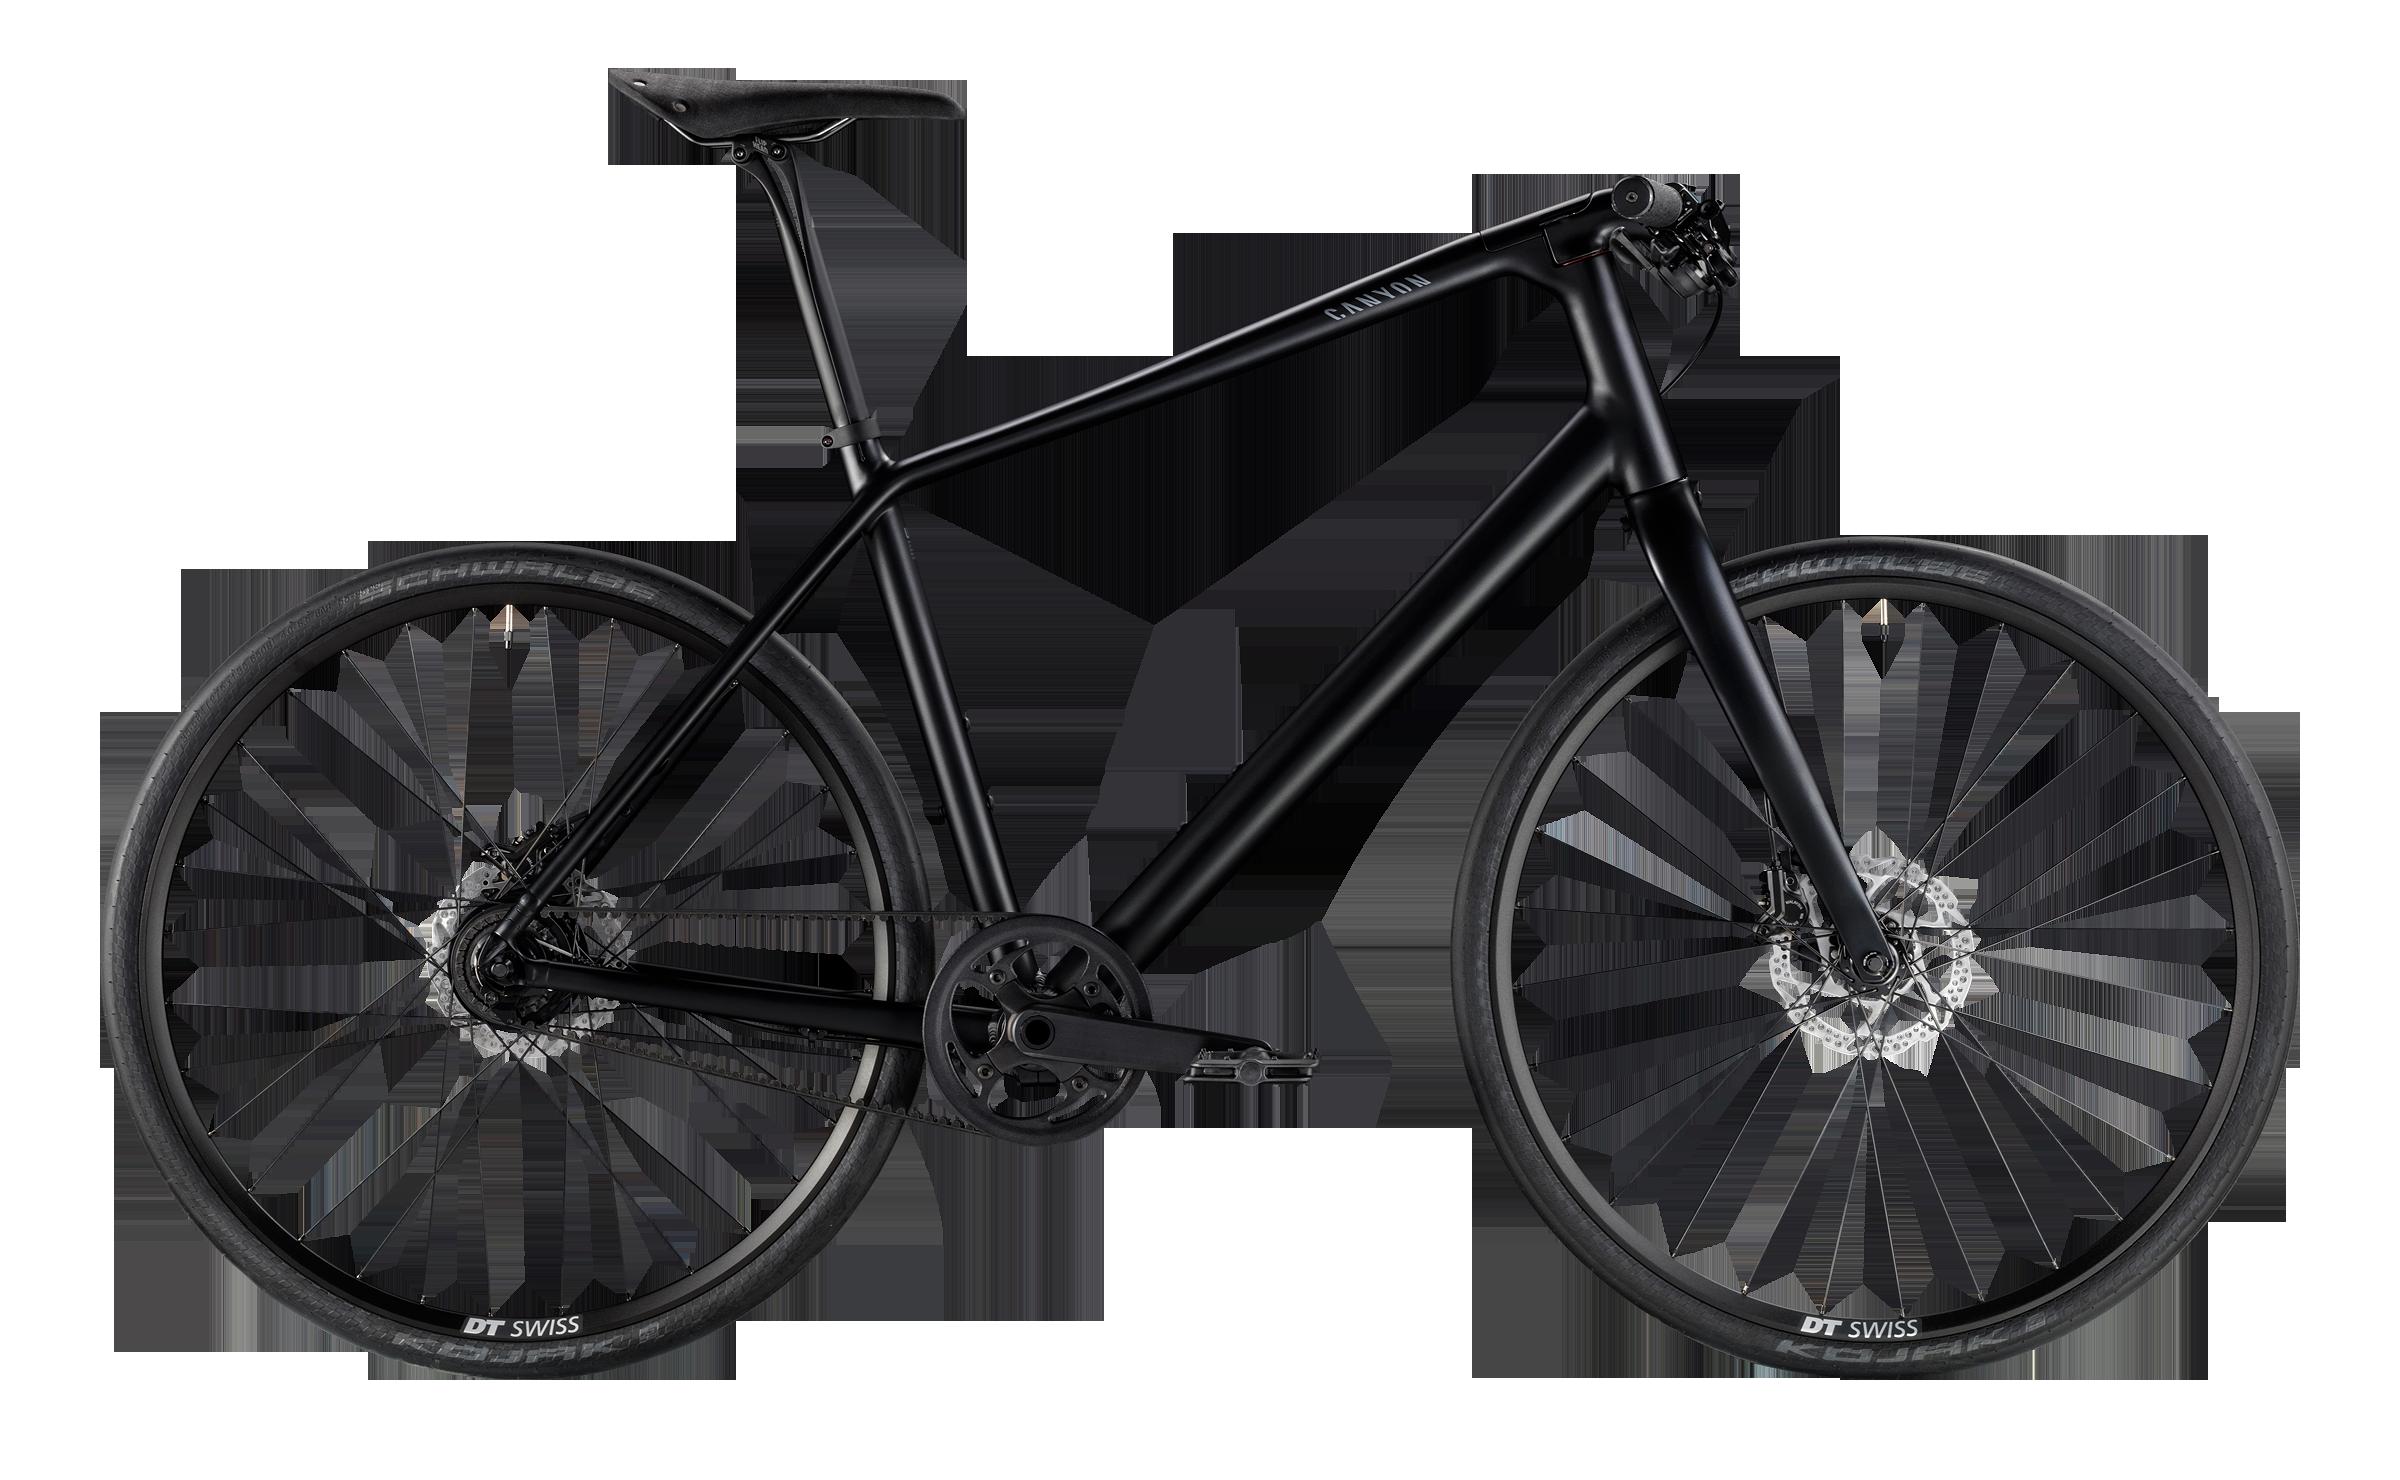 Pin Von Meade Acers Auf Apartment Wishlist Fahrrad